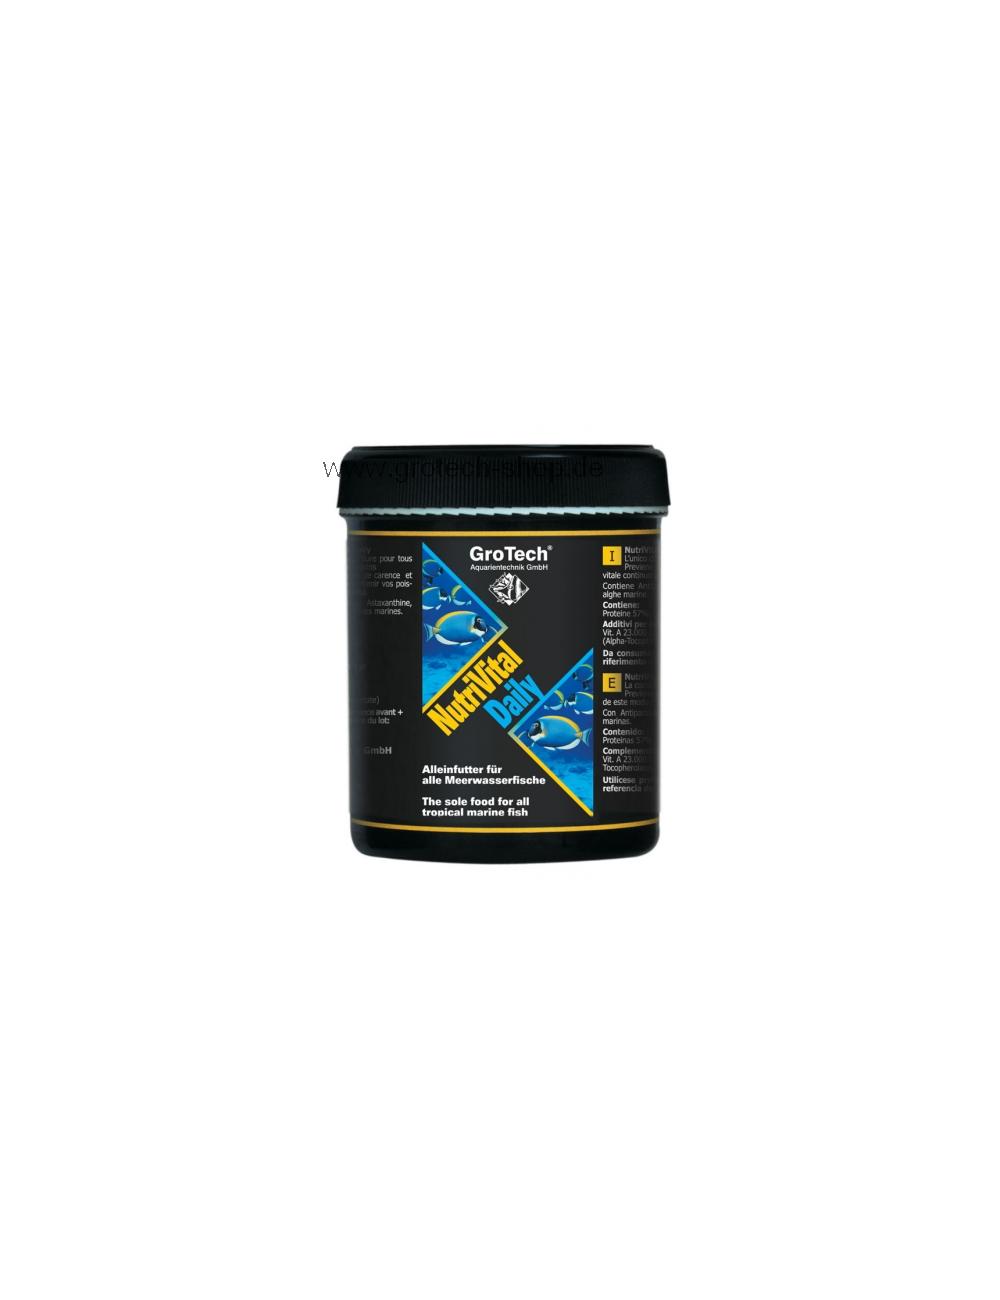 GROTECH - NutriVital Daily 0,6-0,9mm 285ml - Nourriture pour poissons